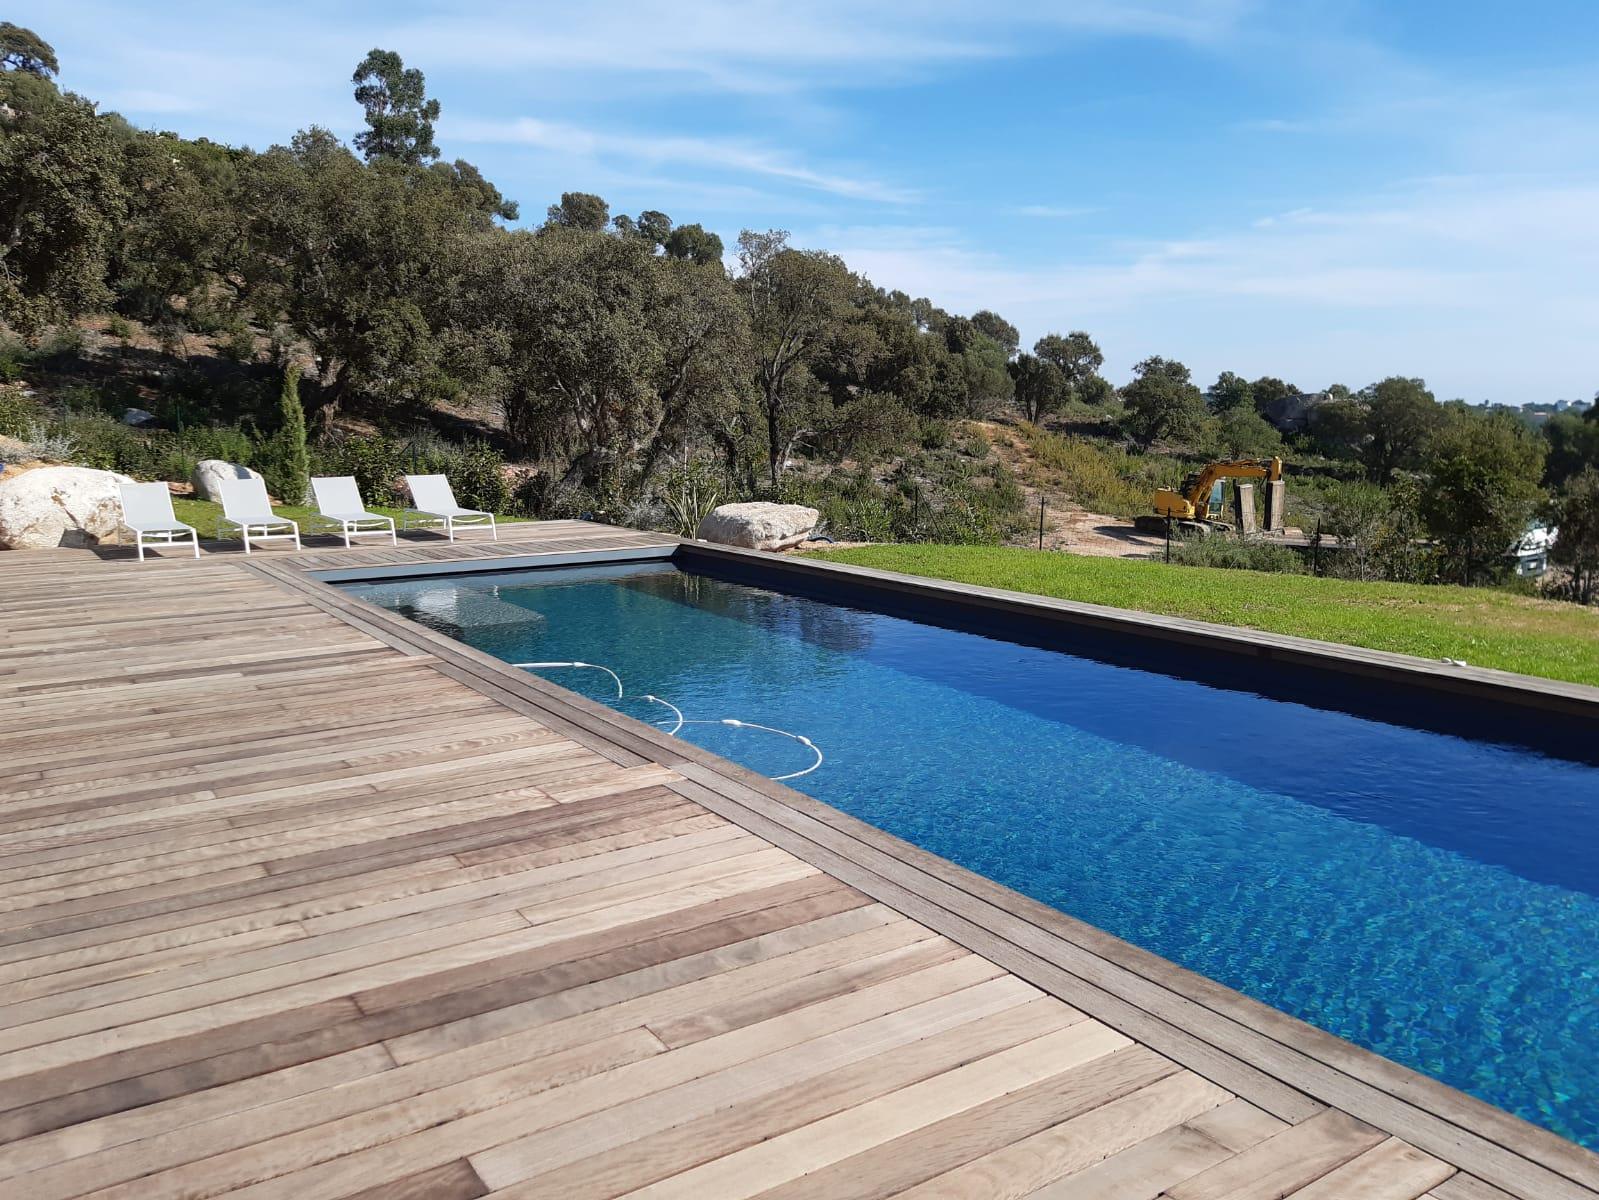 Korsika Ferienhaus Meerblick; Pool